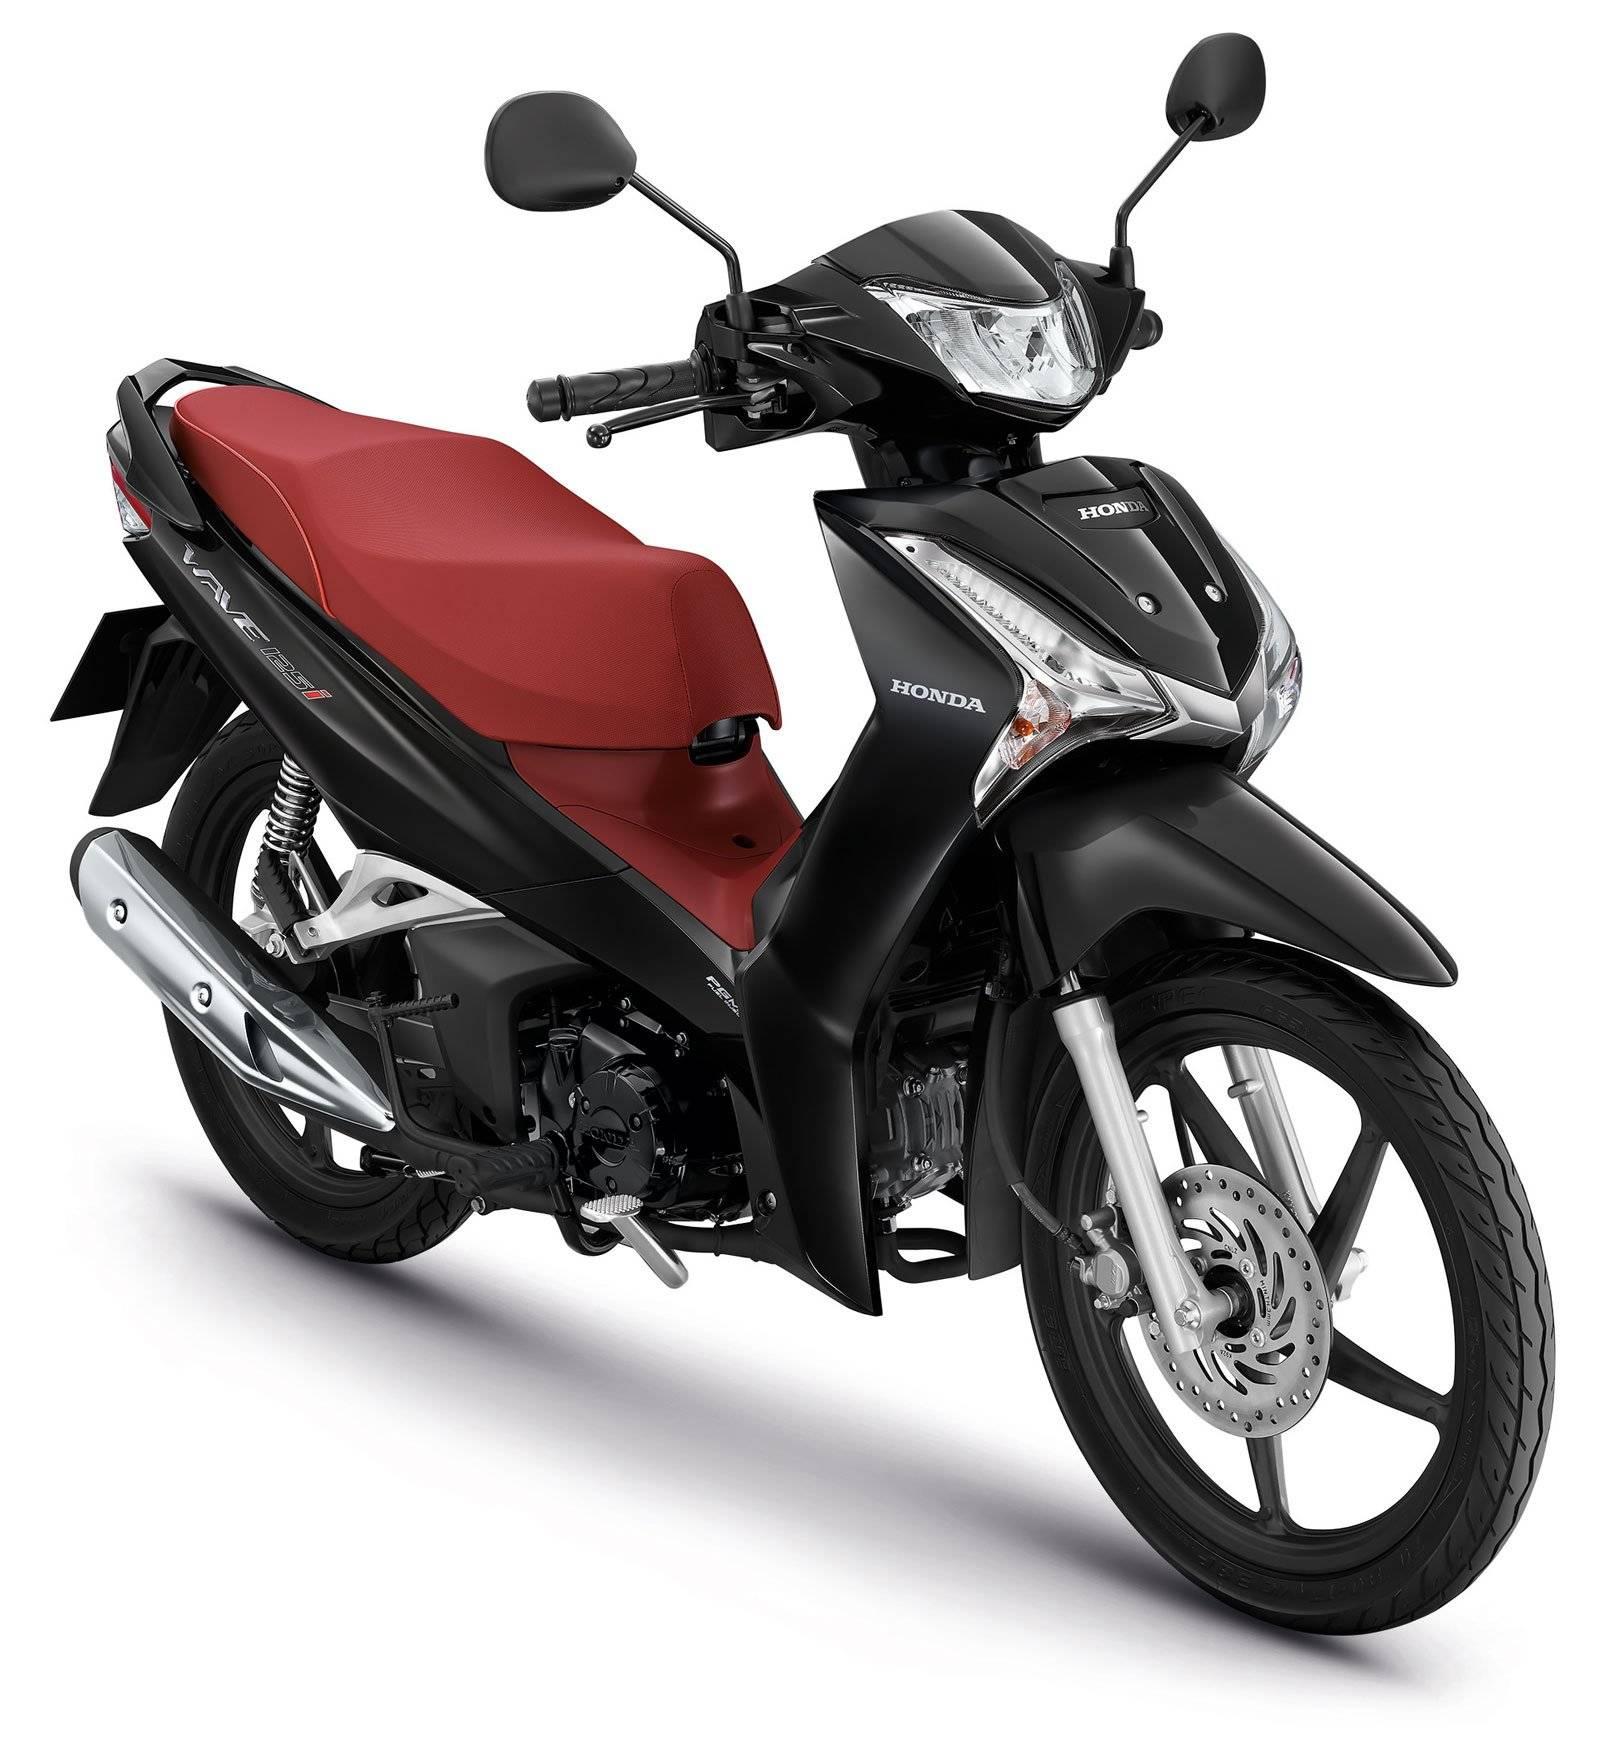 Honda Supra X 125 Facelift Rilis Di Thailand Makin Futuristik